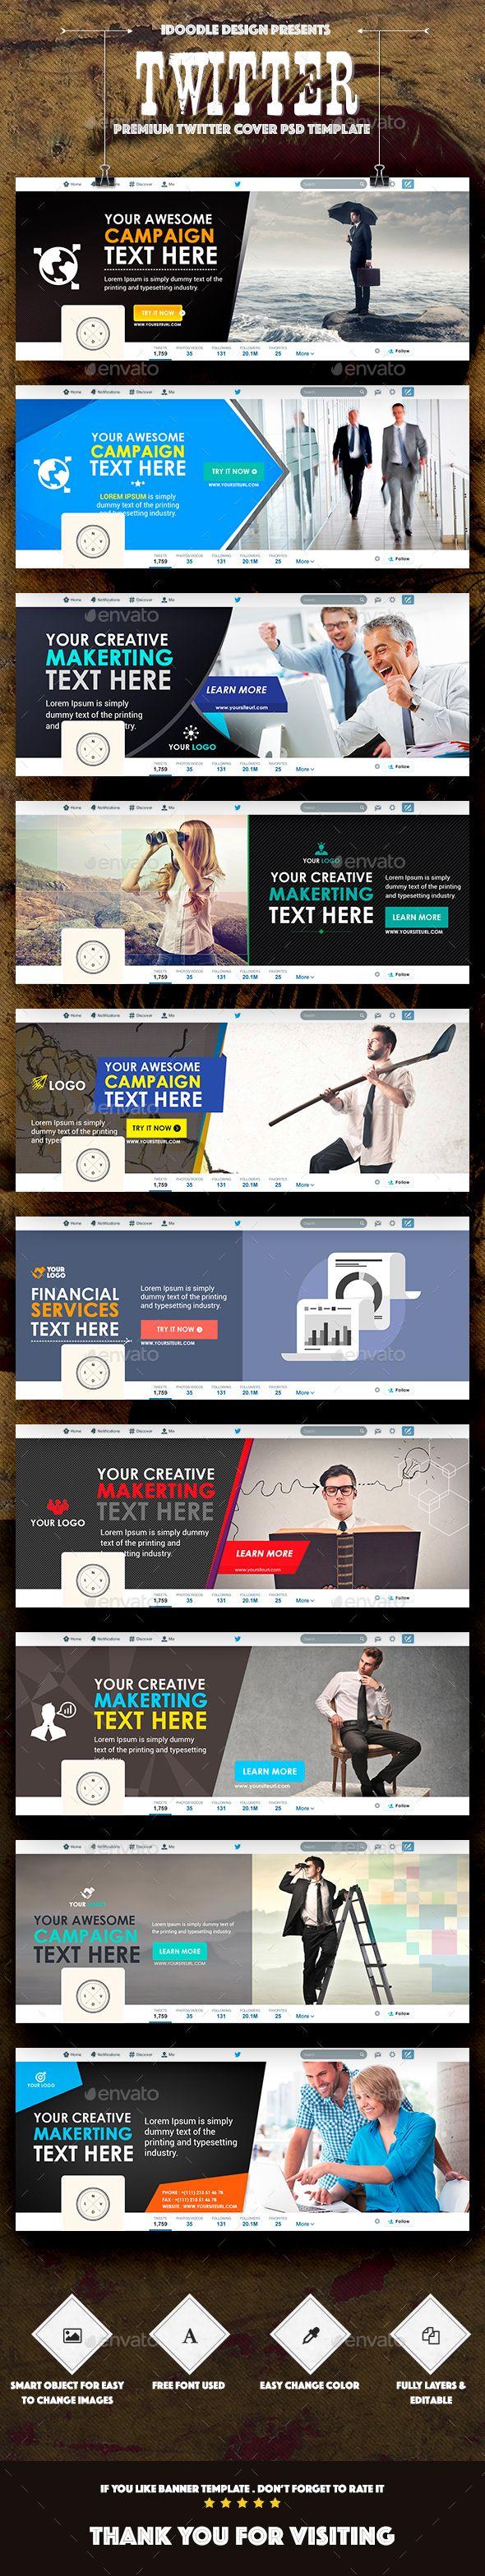 10 best Twitter Header Designs images on Pinterest | Header design ...